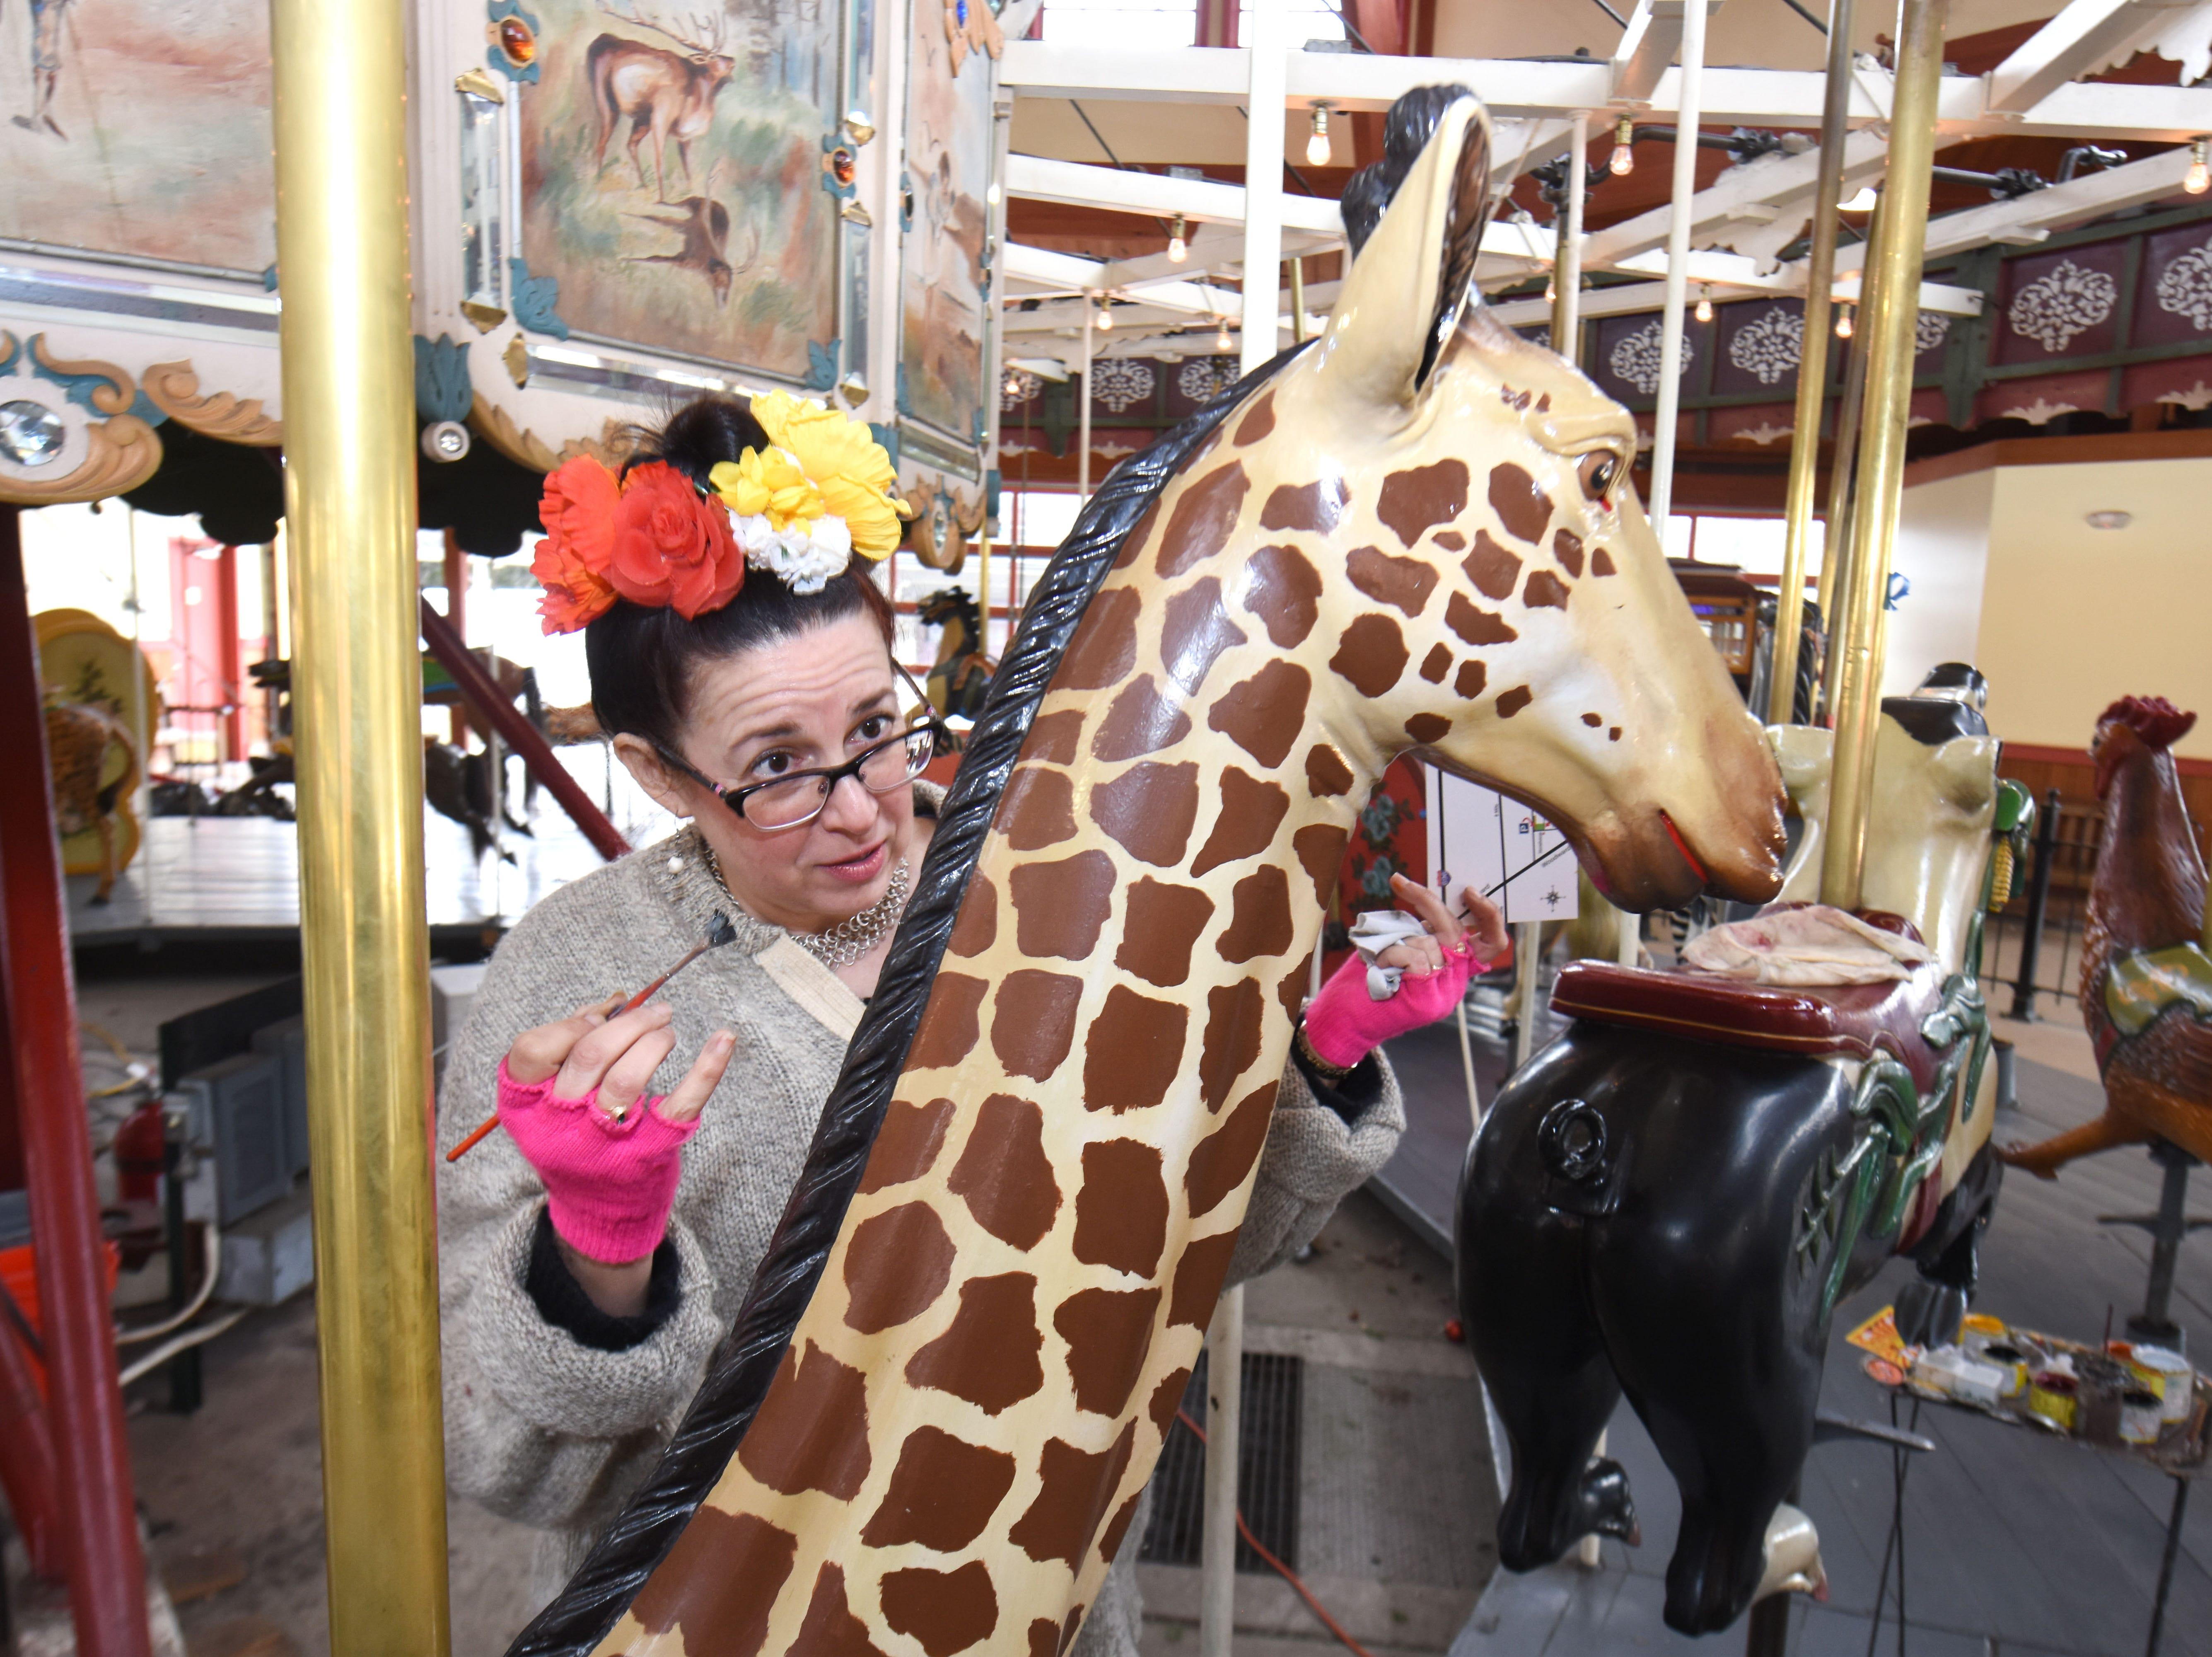 Julie Fournier works on the restoration of a giraffe figure at Greenfield Village in Dearborn.